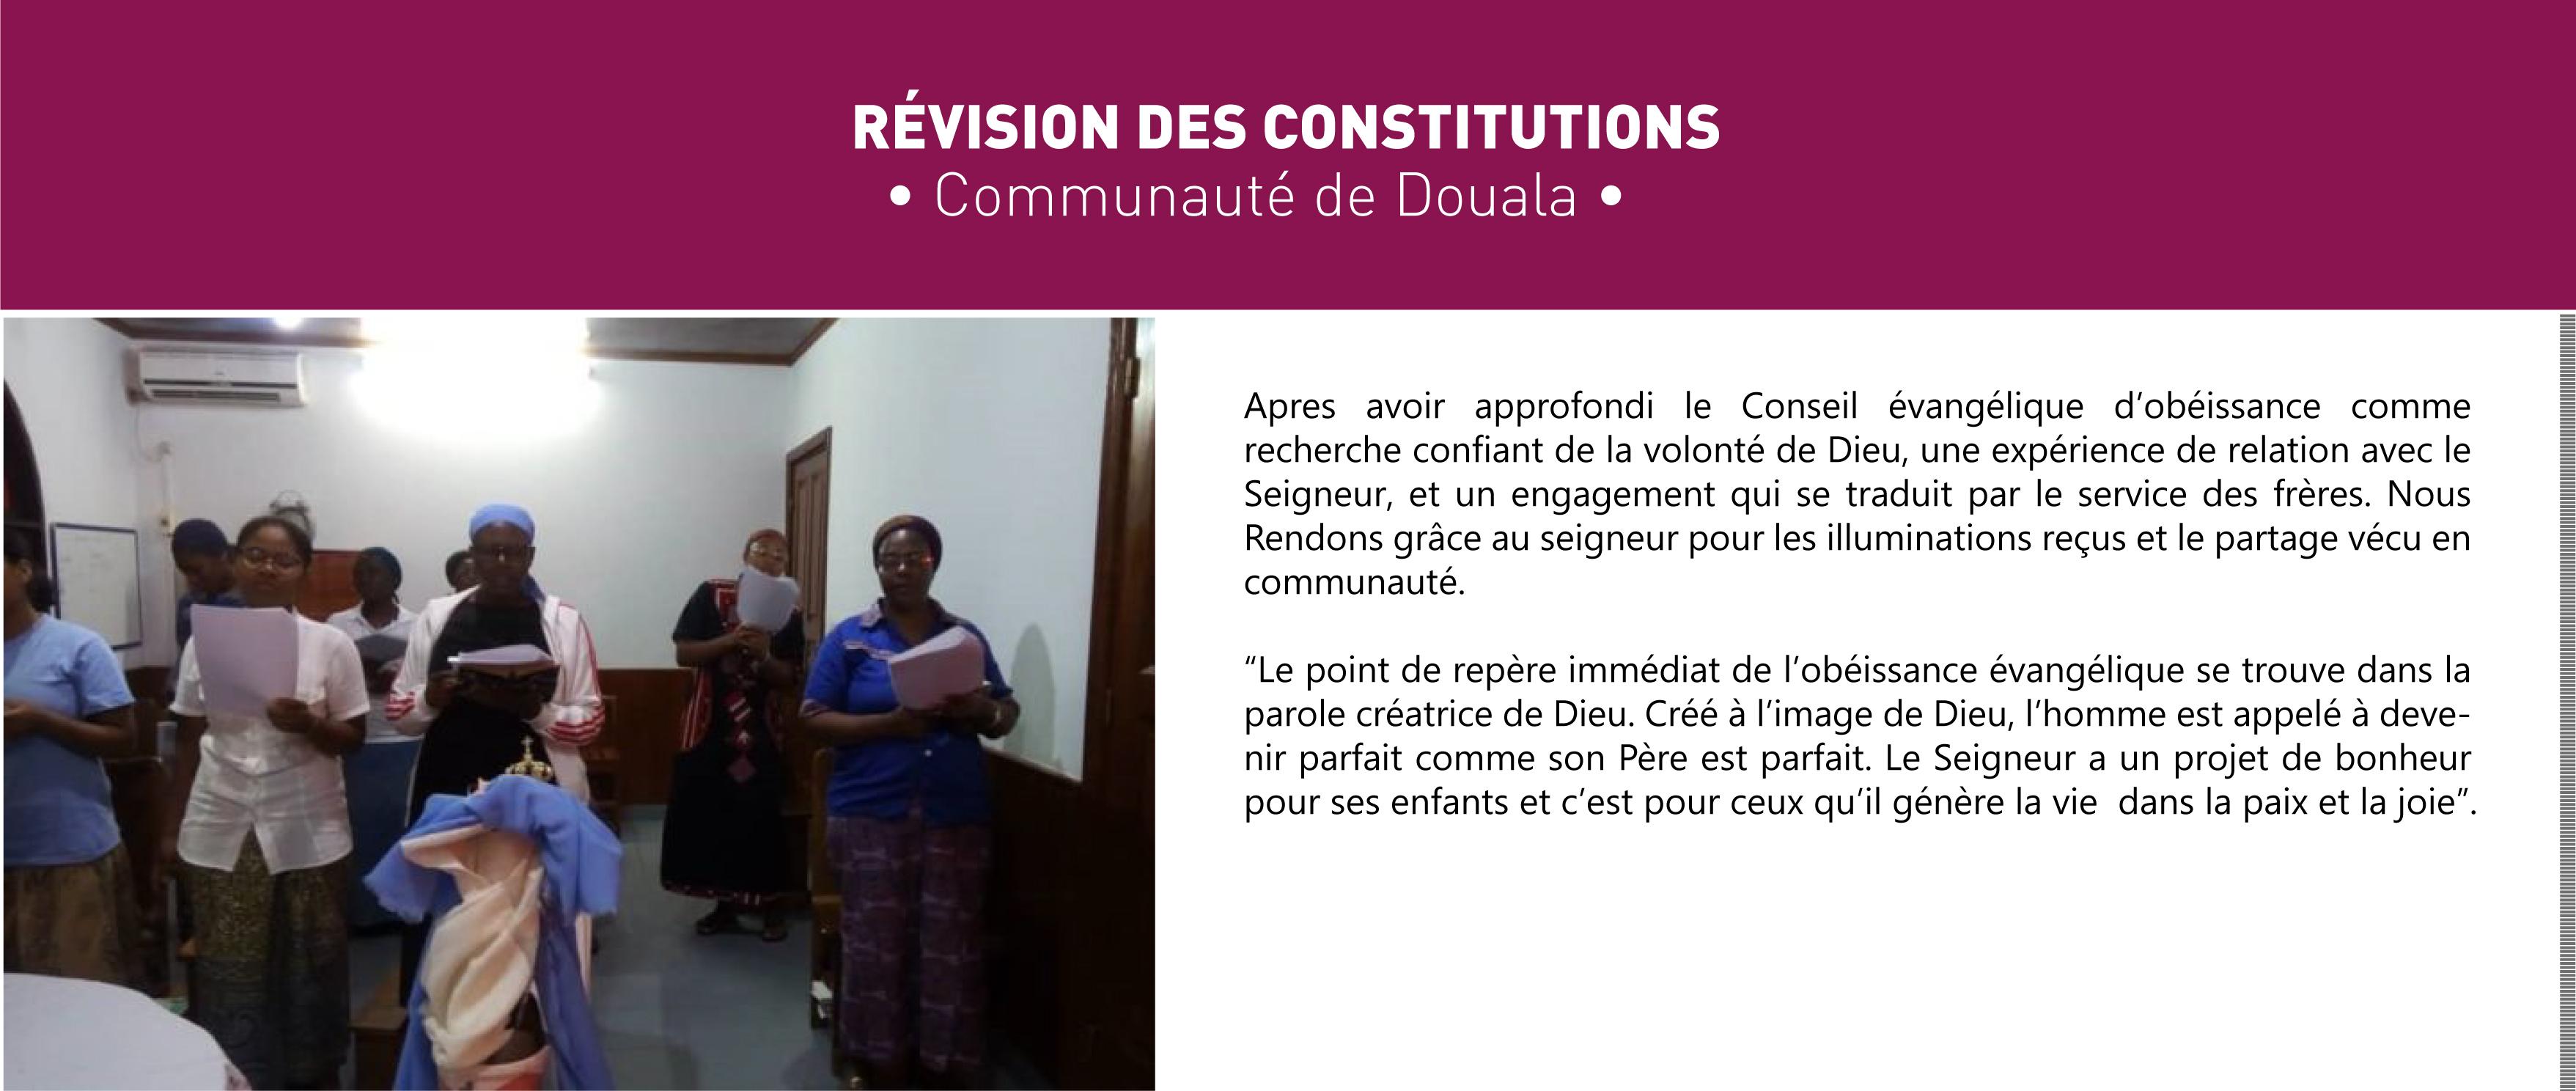 revision-des-constitutions-site-3-03